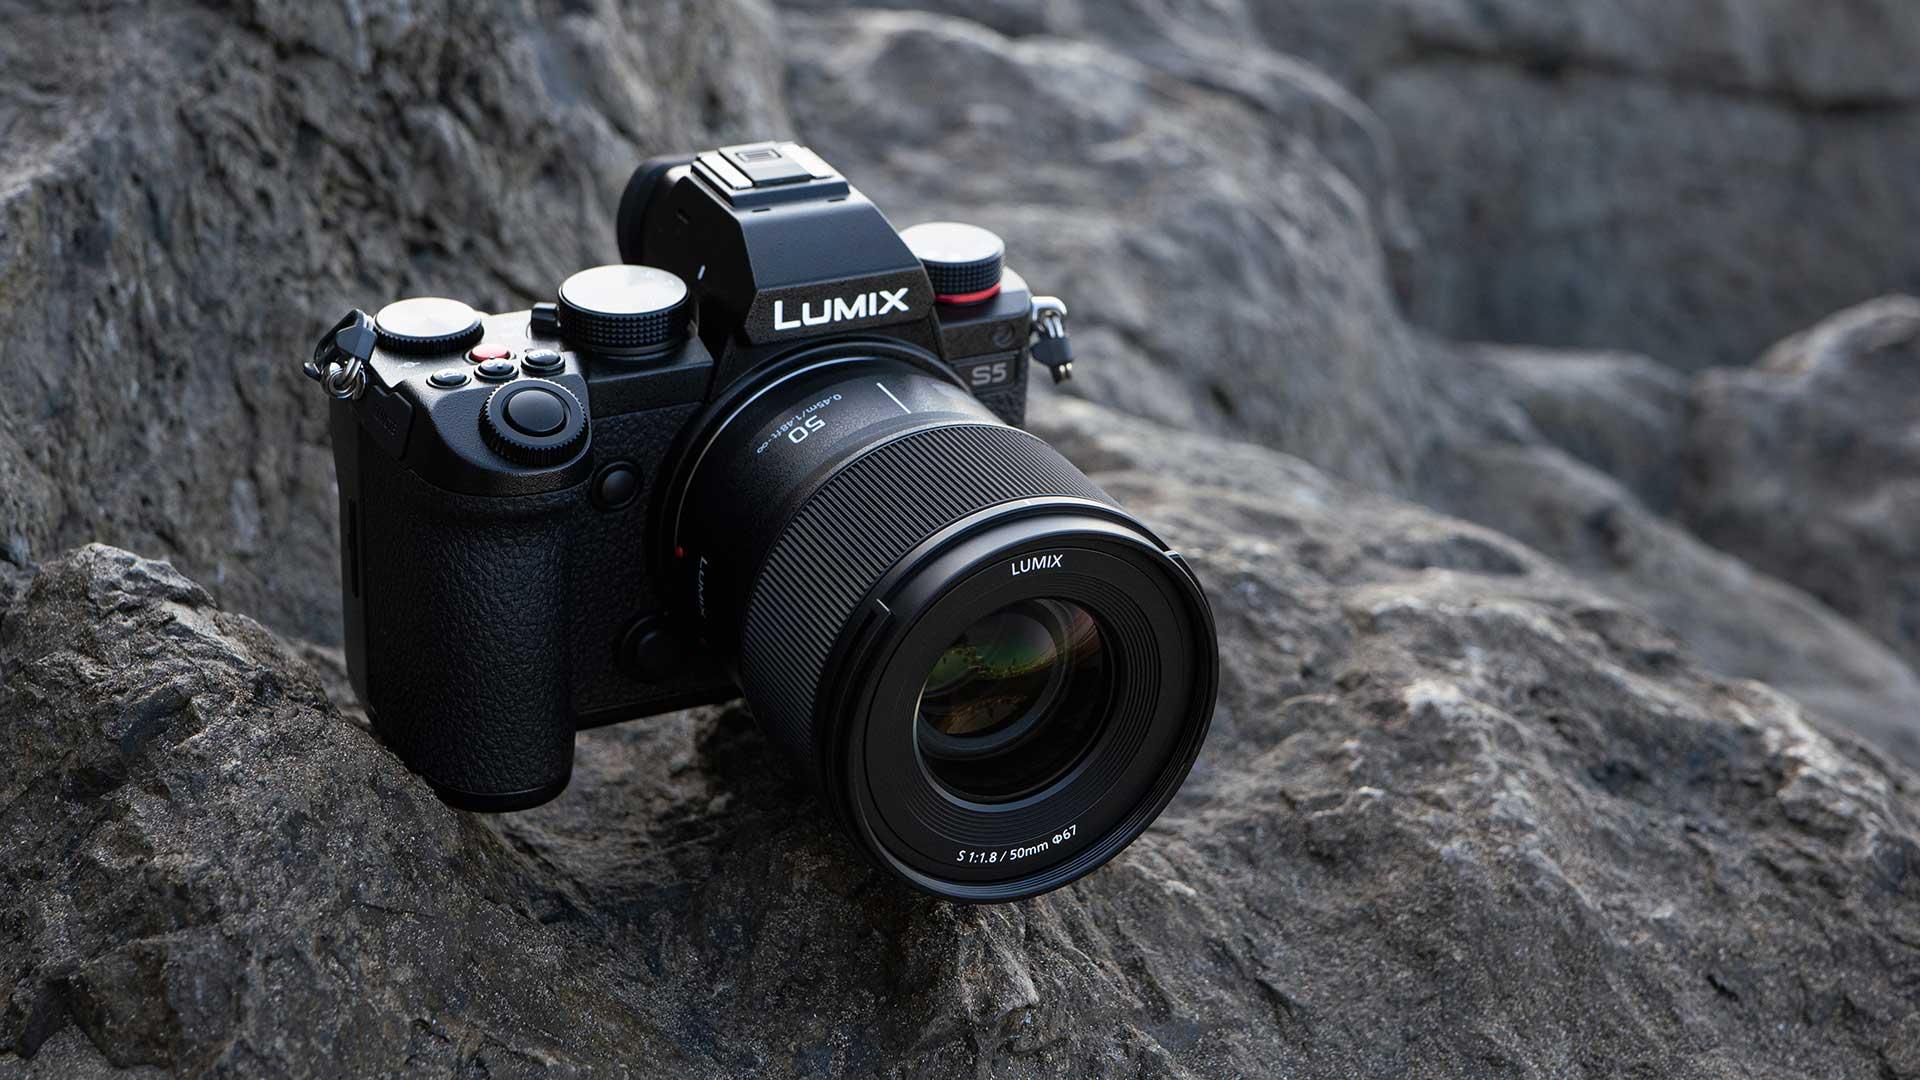 The new LUMIX S 50mm f/1.8 lens. Image: Viviana Galletta.